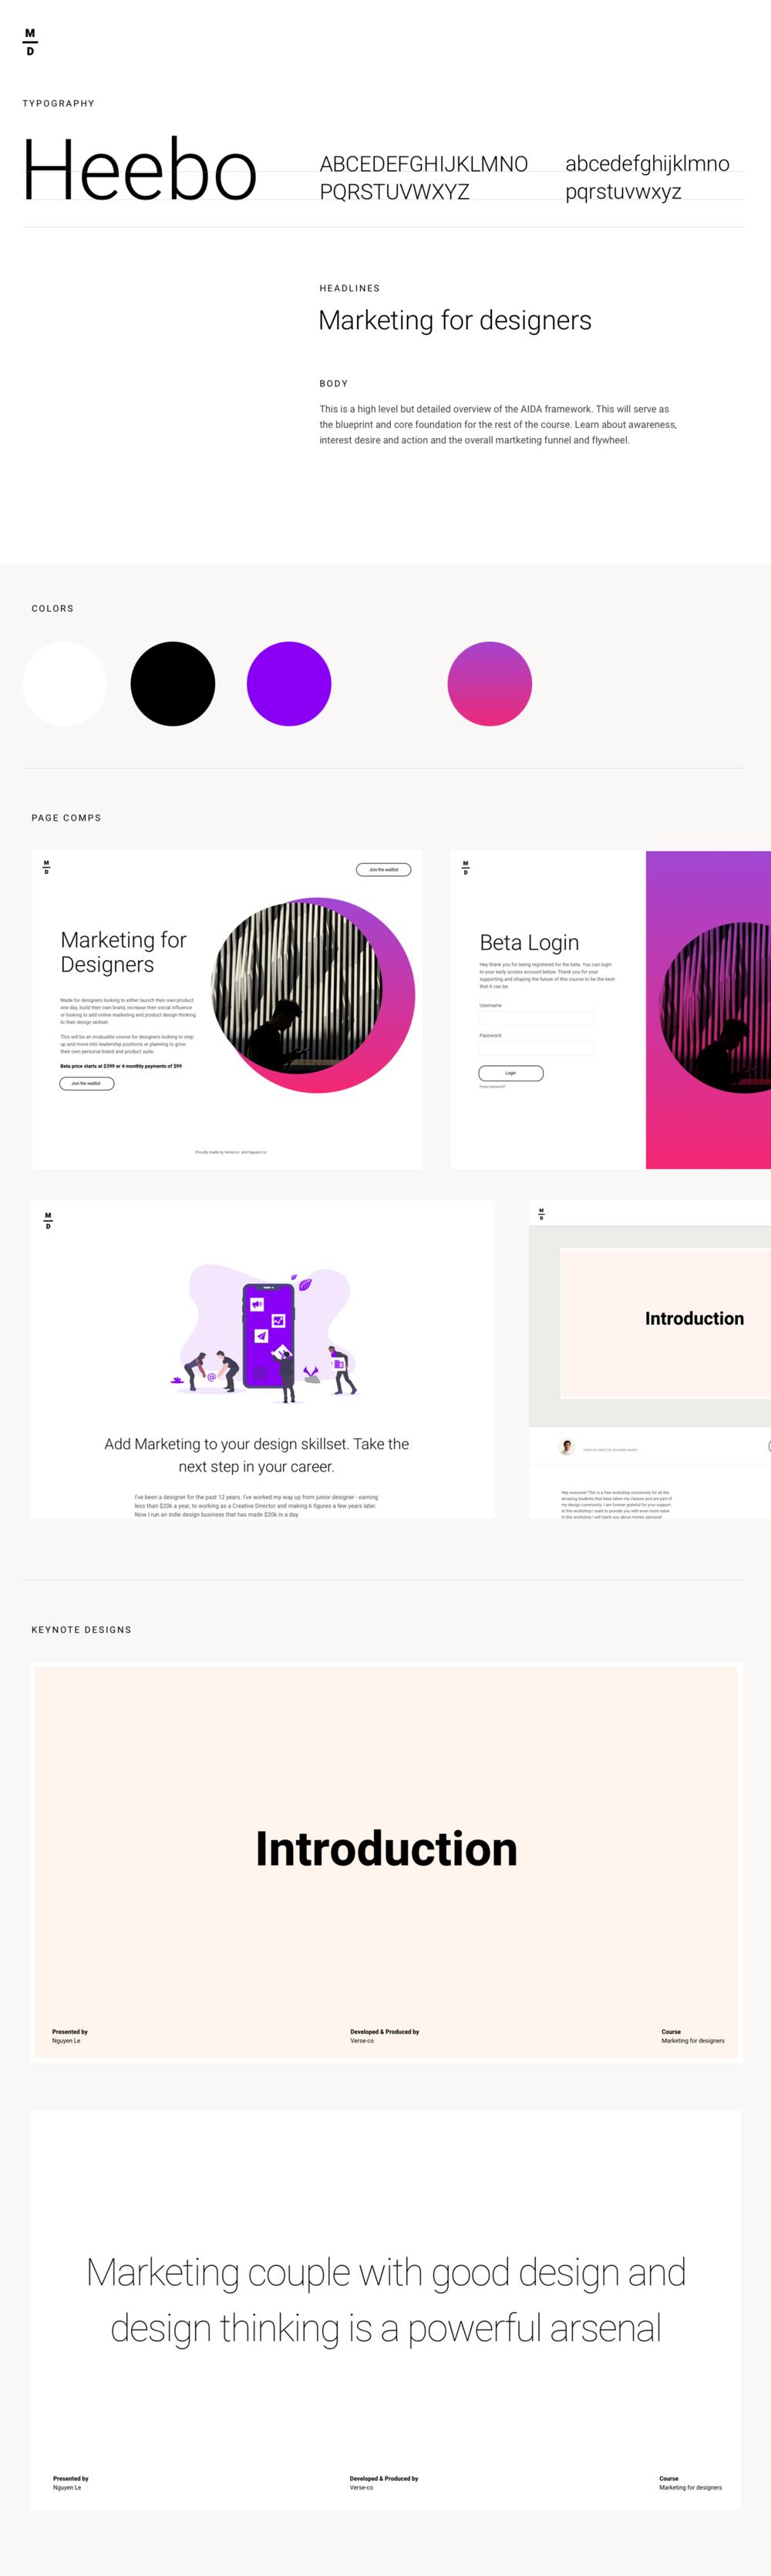 marketing-for-designers-art-direction.png